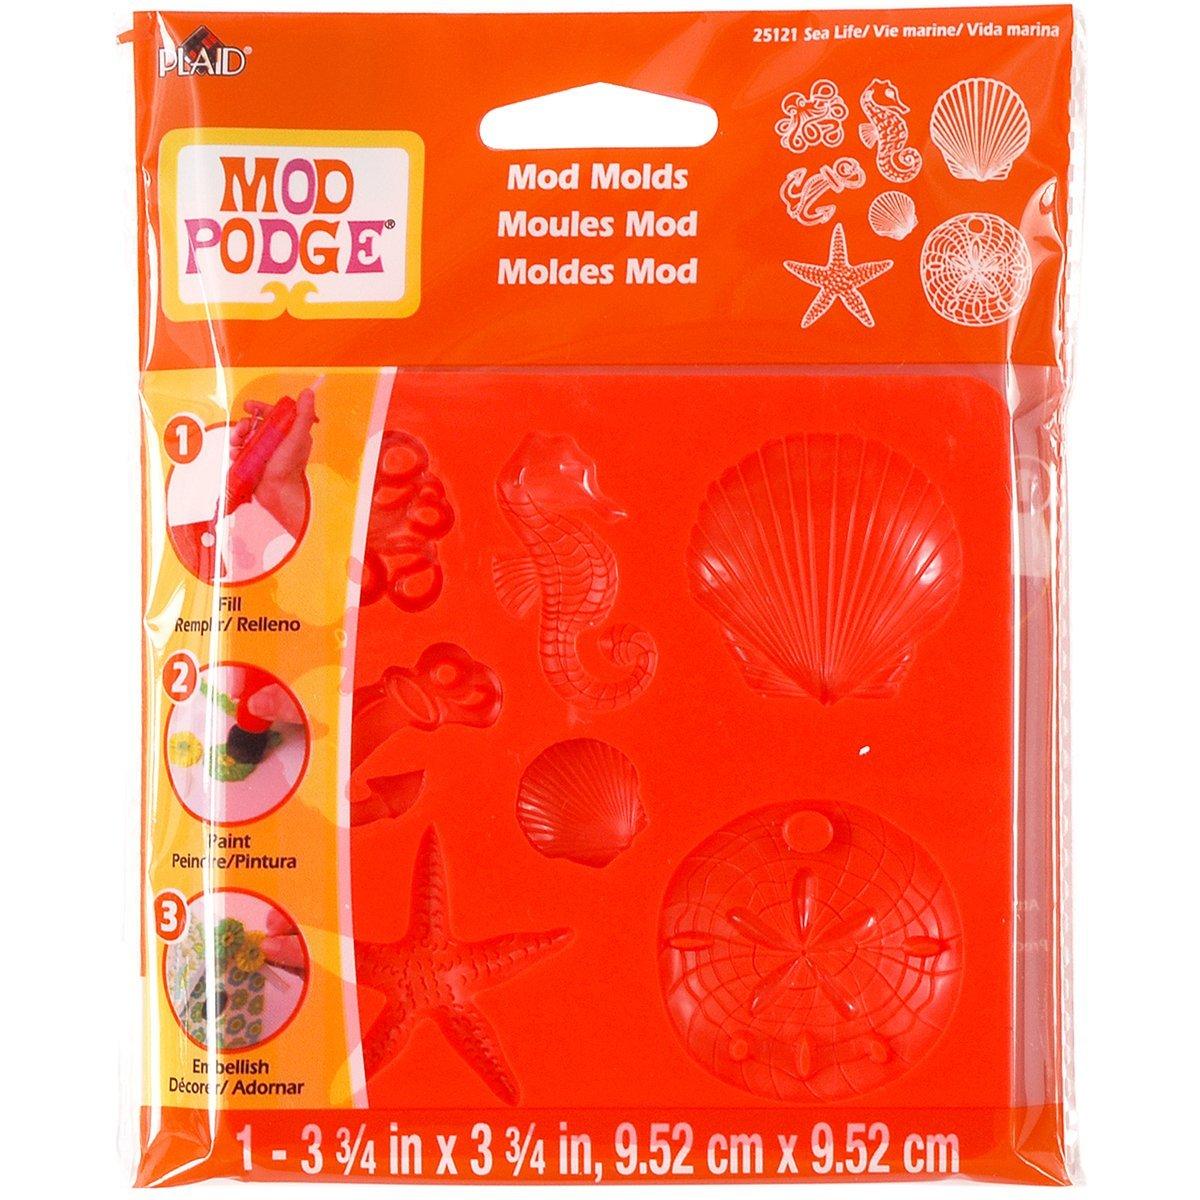 Mod Podge ® Mod Molds - Sea Life